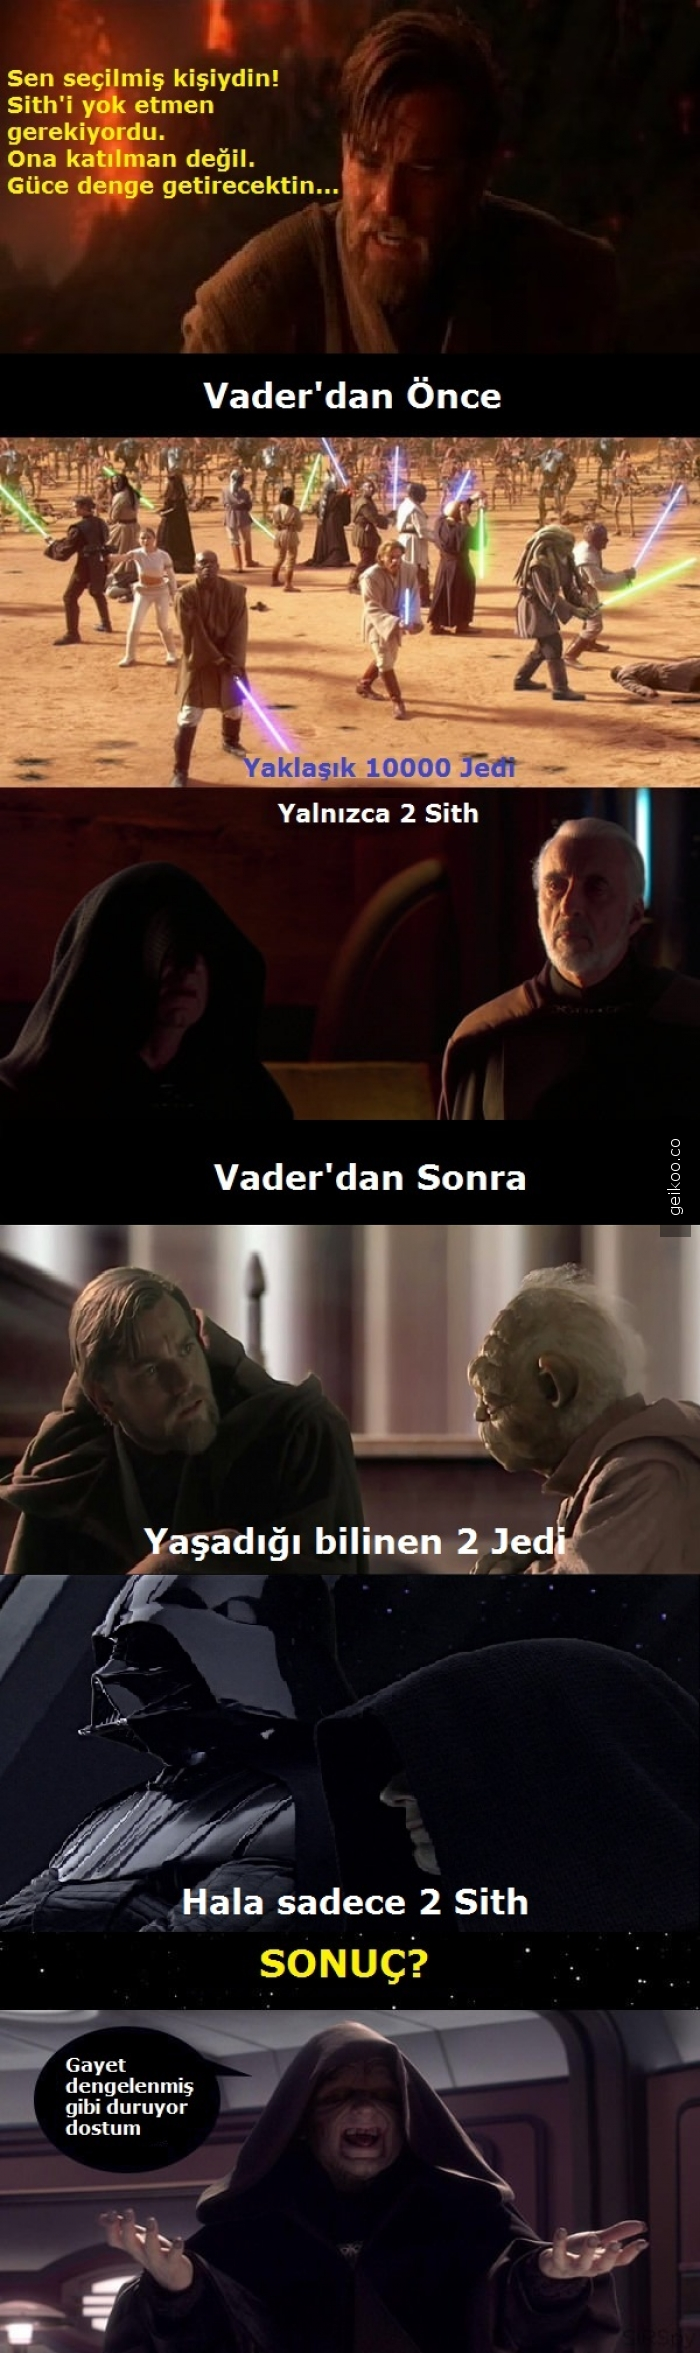 Darth Vader aslında güce dengeyi getirdi